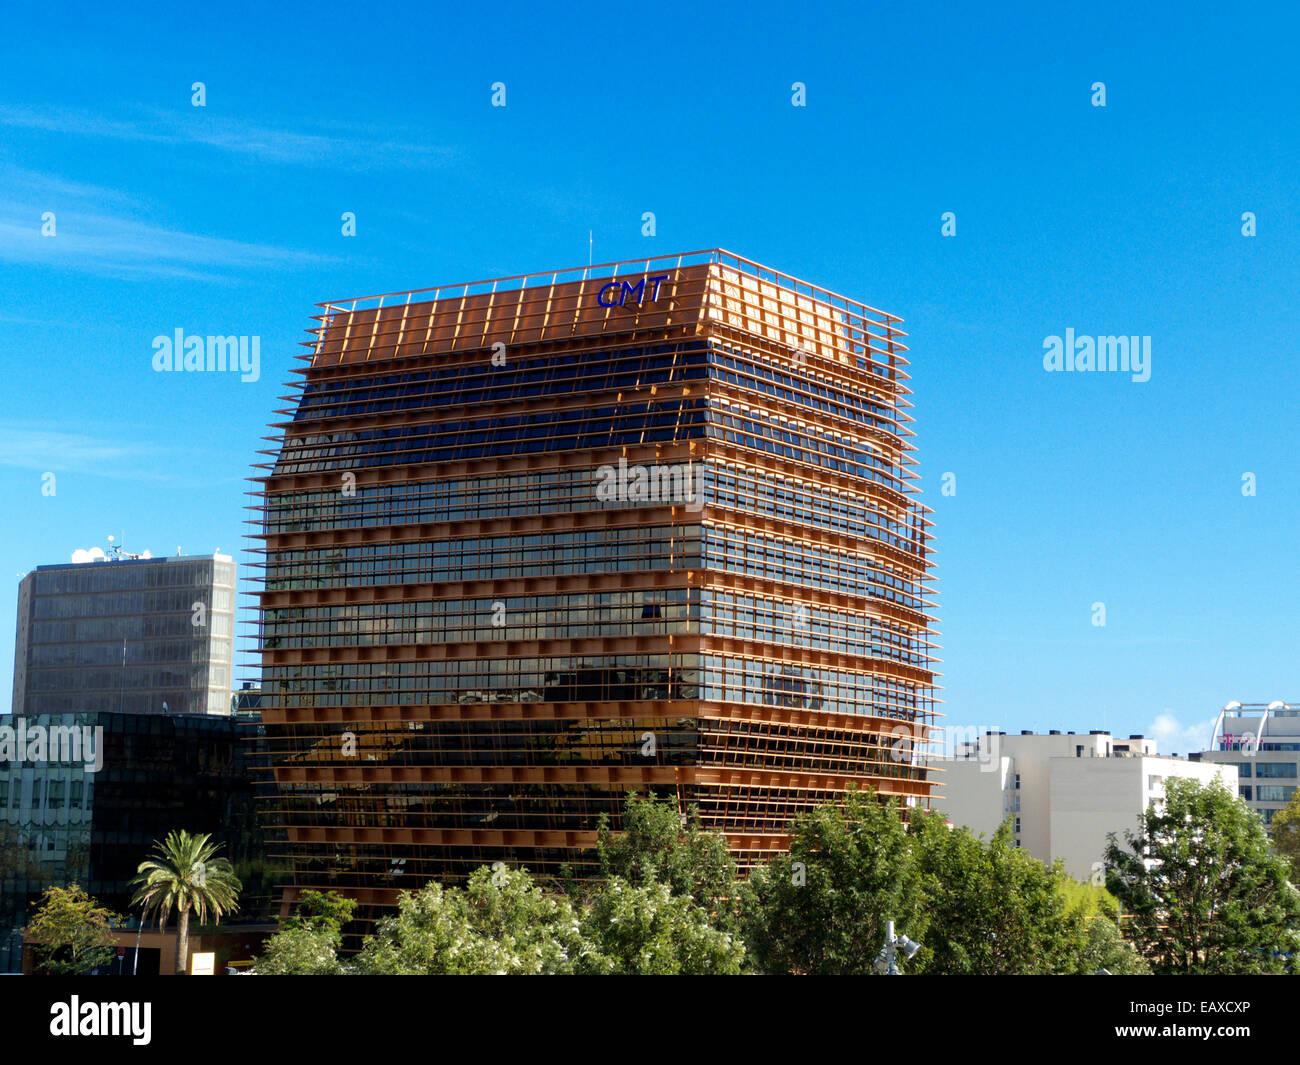 Barcelona Placa de les Glories modern sustainable building Spain Catalonia - Stock Image